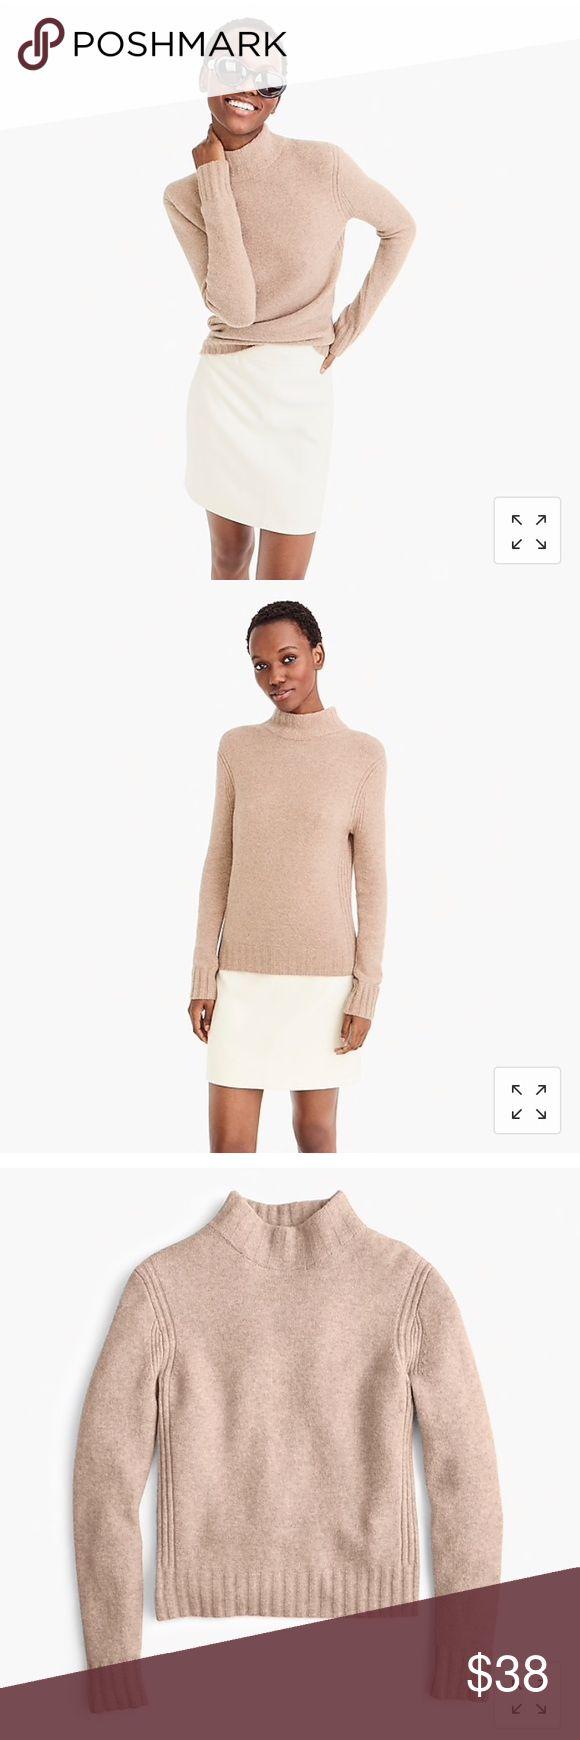 NWT Jcrew Mockneck Sweater Beige Color: Heather Mushroom  The color does not com…